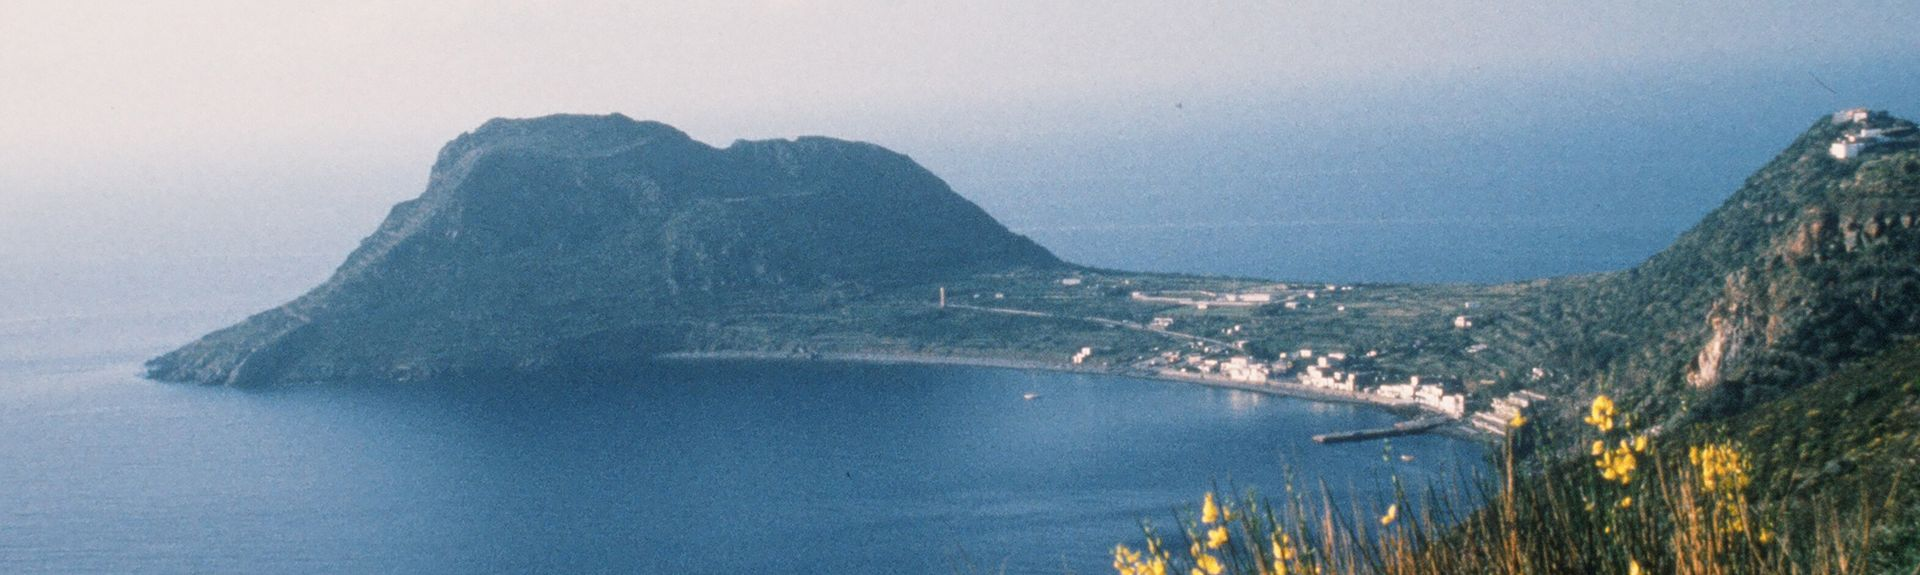 Filicudi, Sizilien, Italien